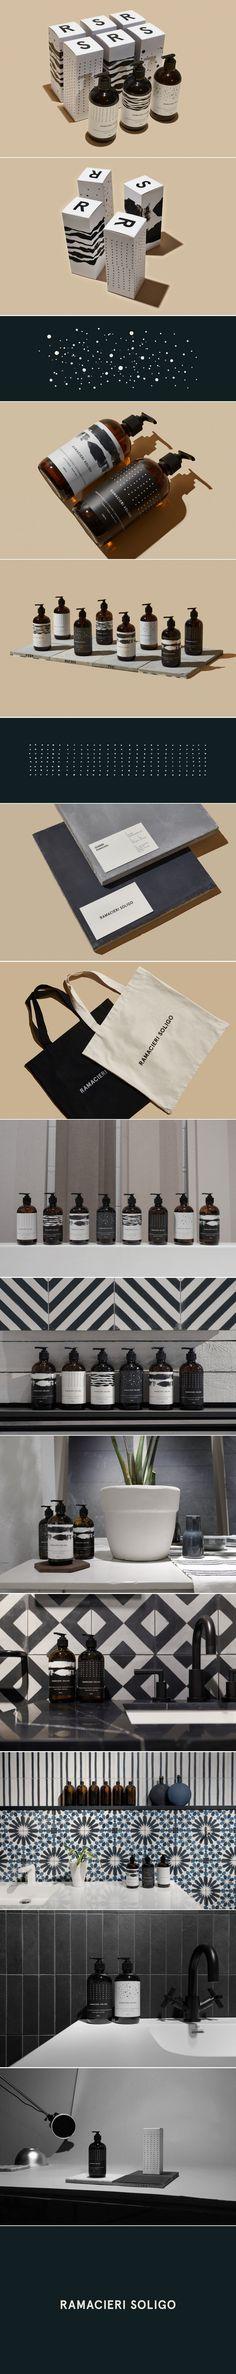 Ramacieri Soligo Adds Handsoap To Collection — The Dieline | Packaging & Branding Design & Innovation News